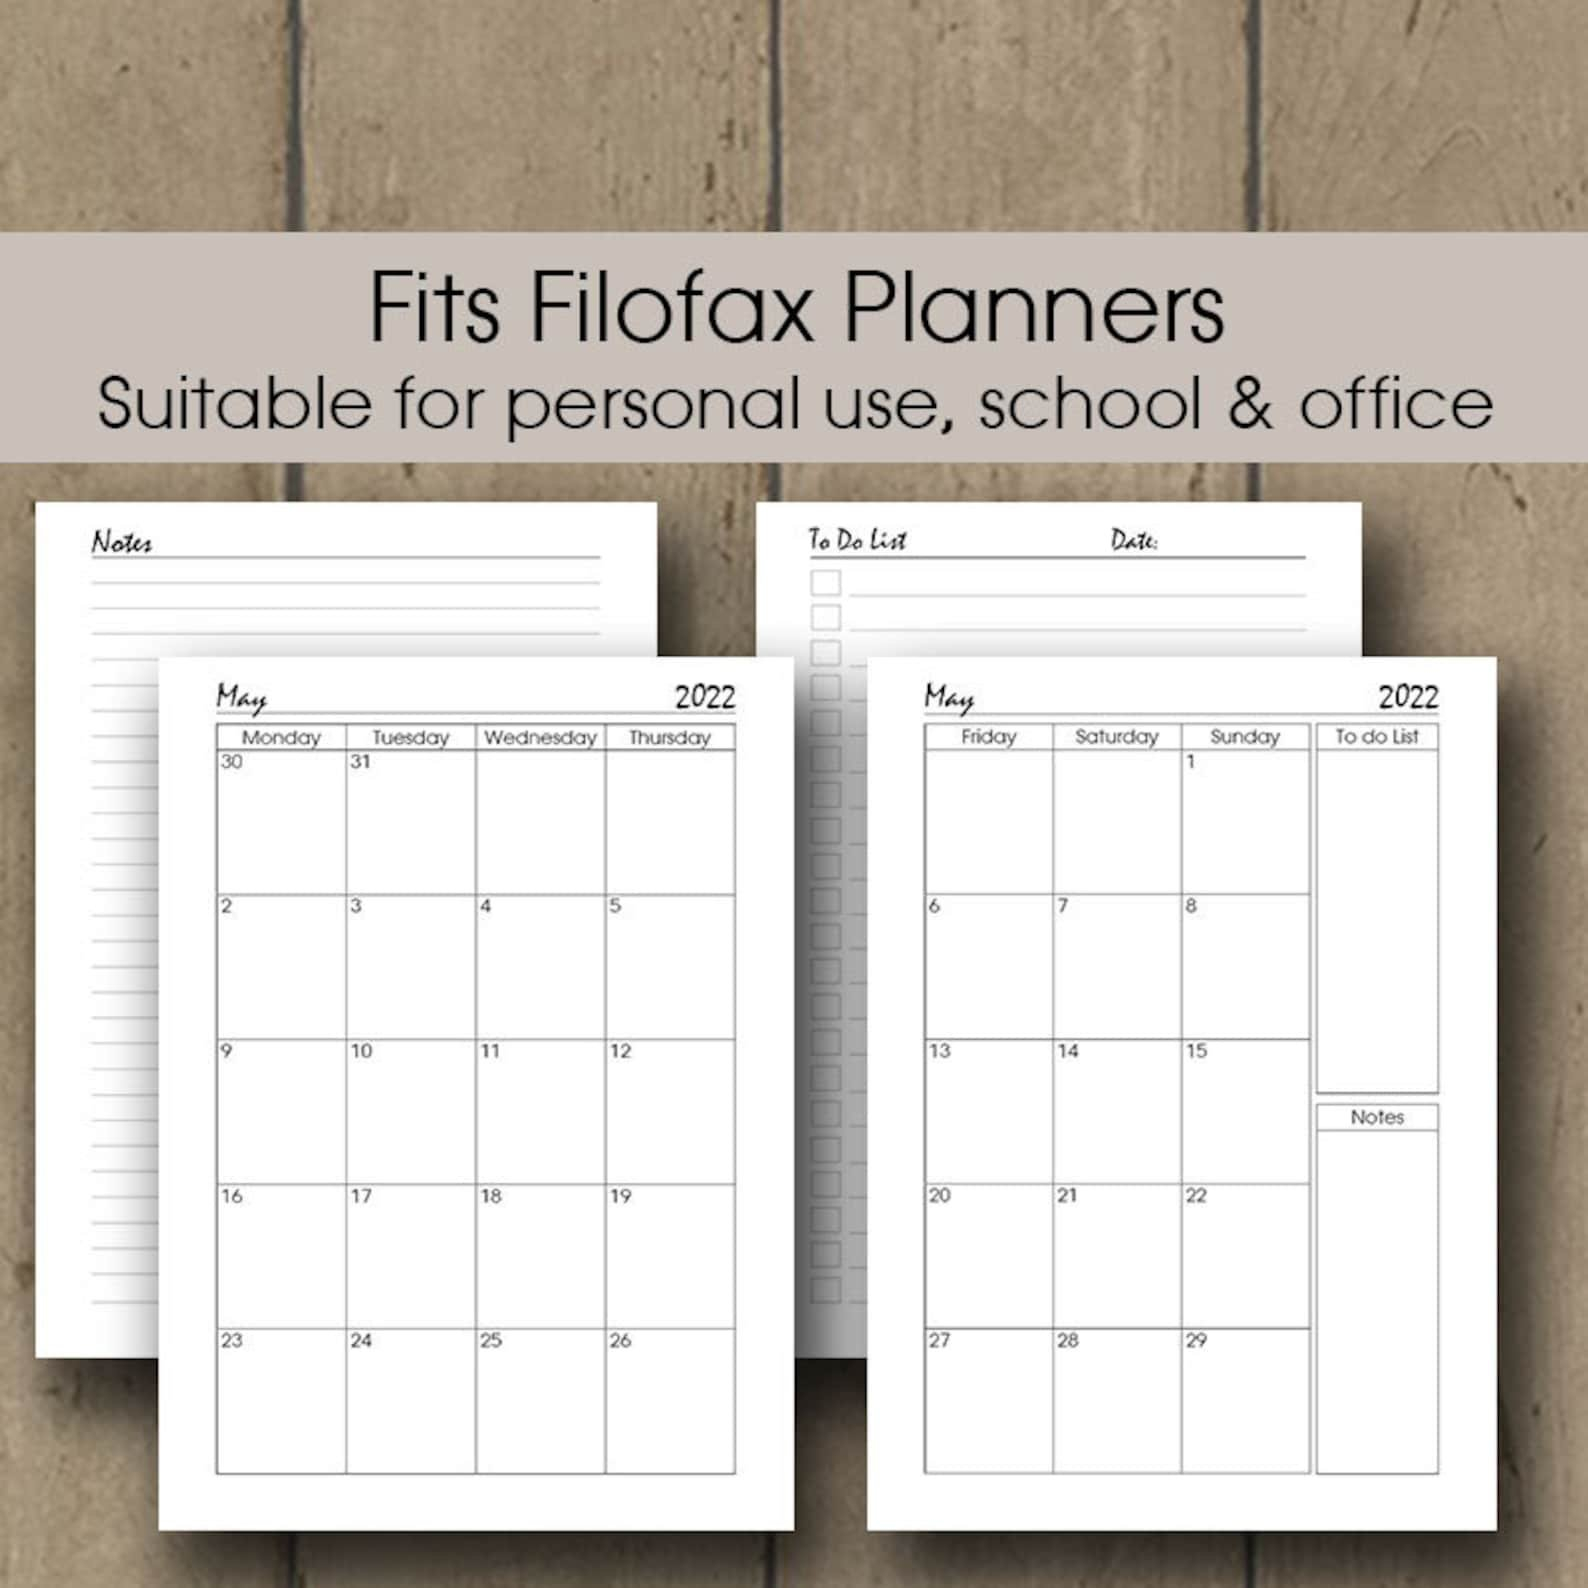 Printable Planner 2022 Daily Weekly Planner Insert 2022 A4 throughout Printable Daily Planner 2022 Image